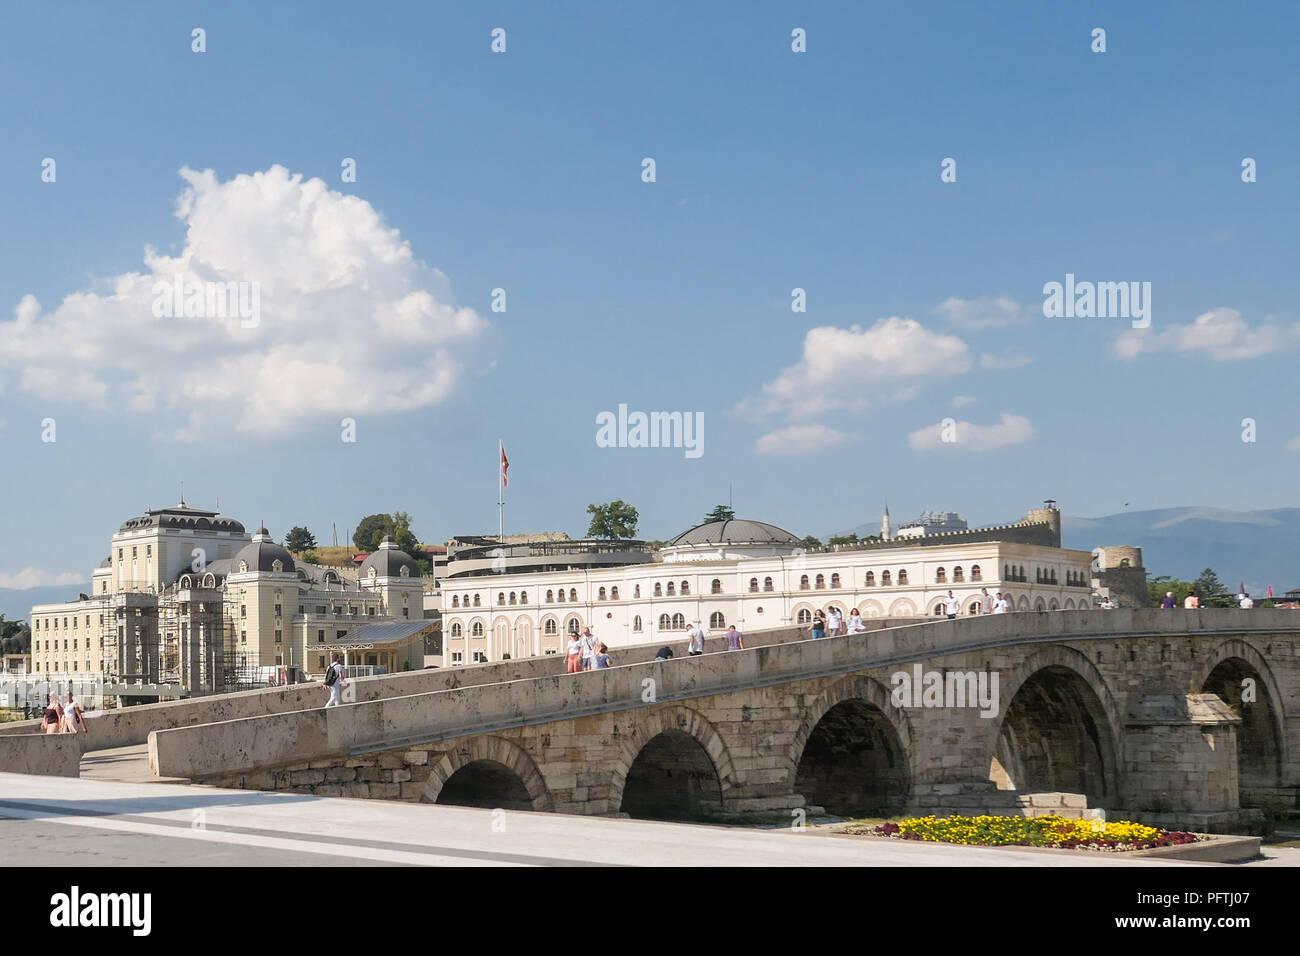 Skopje, Macedonia - Museum of the macedonian struggle and stone bridge - Stock Image